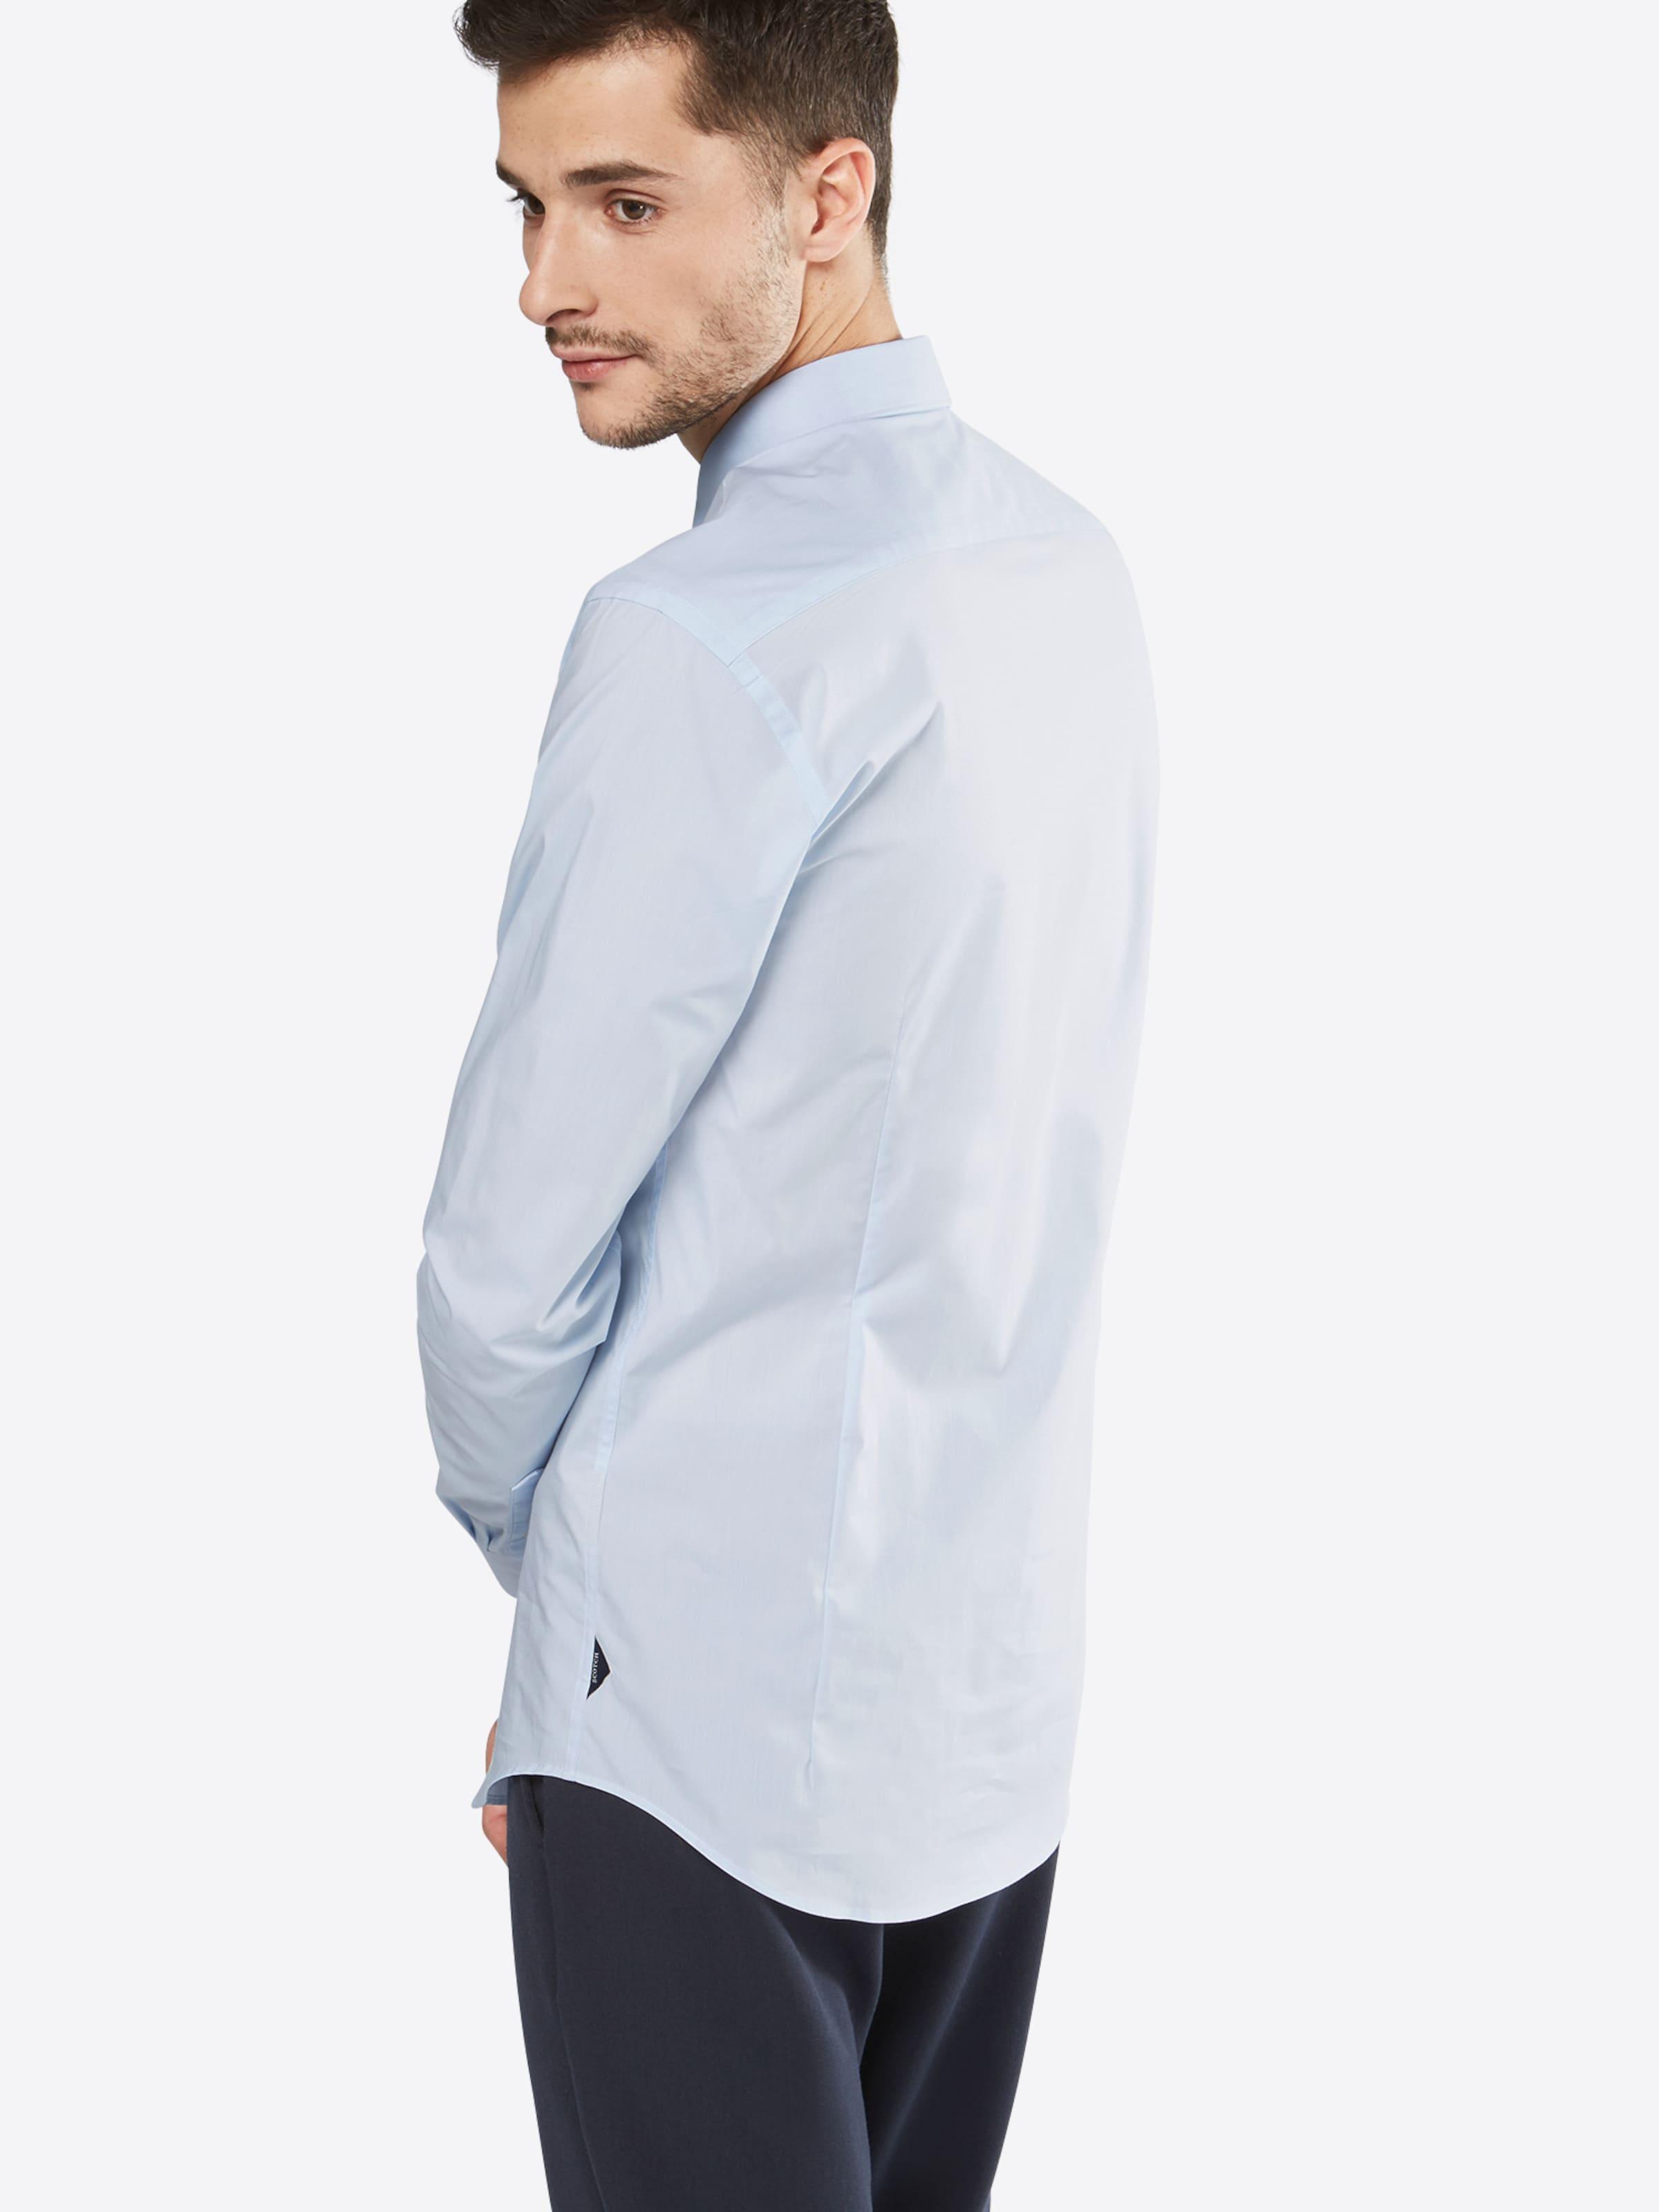 SCOTCH & SODA Hemd 'NOS - Classic longsleeve shirt in crispy cotton/lycra qualit' Werksverkauf iznjRrmq